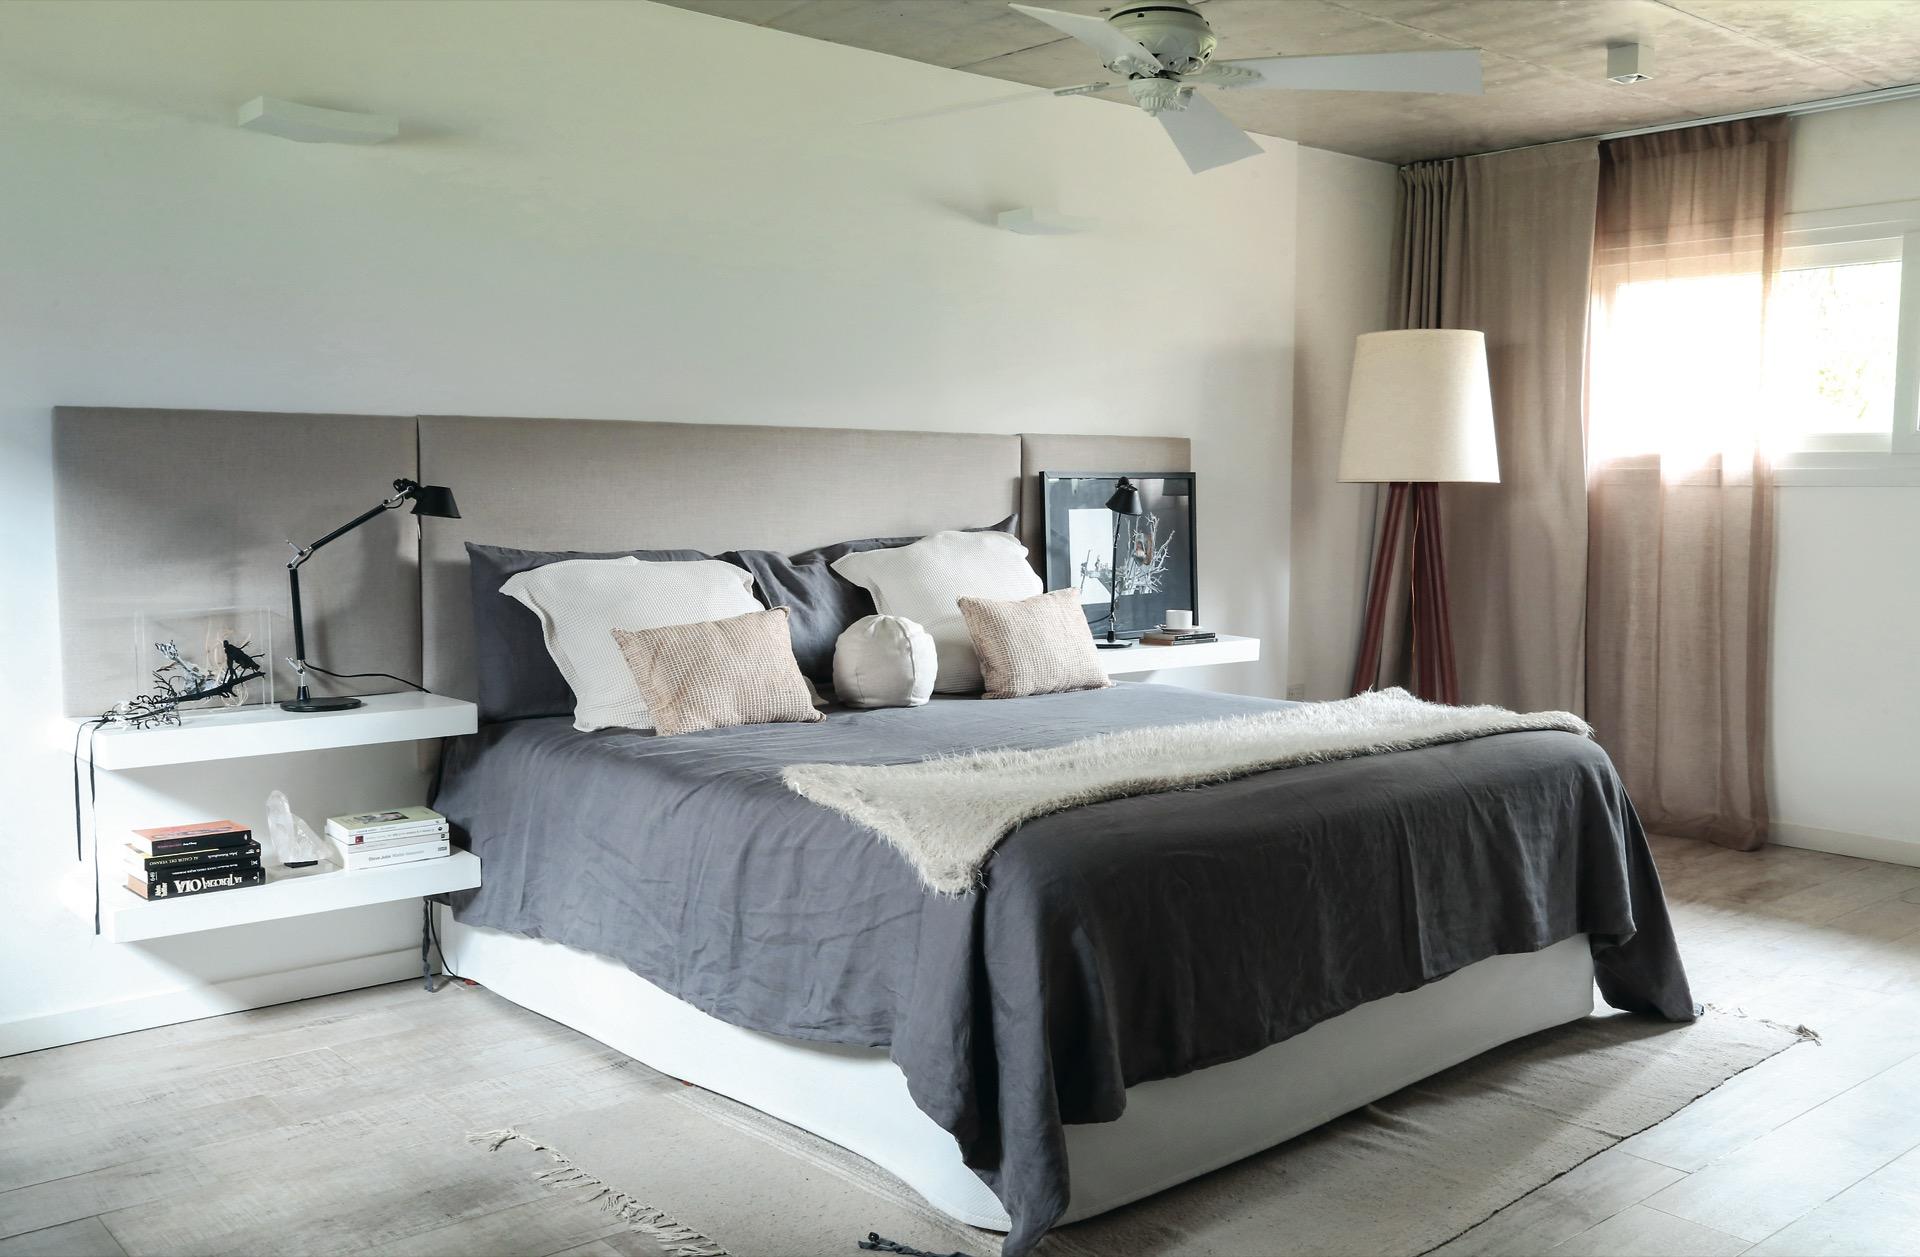 Muebles Baño Barugel Azulay : C?mo transformar un loft en una zona de confort fm libre